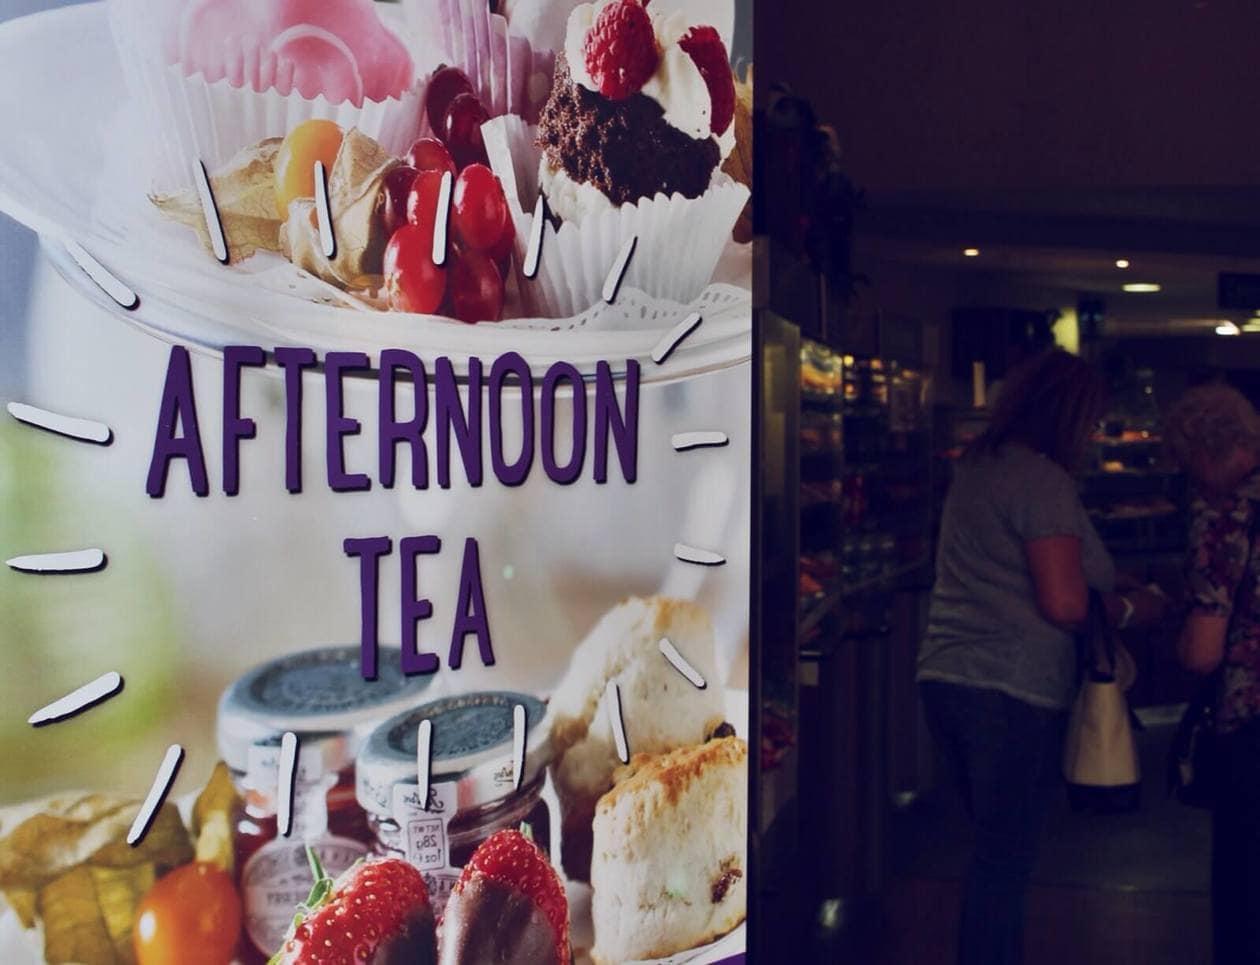 Afternoon Tea at Dobbies